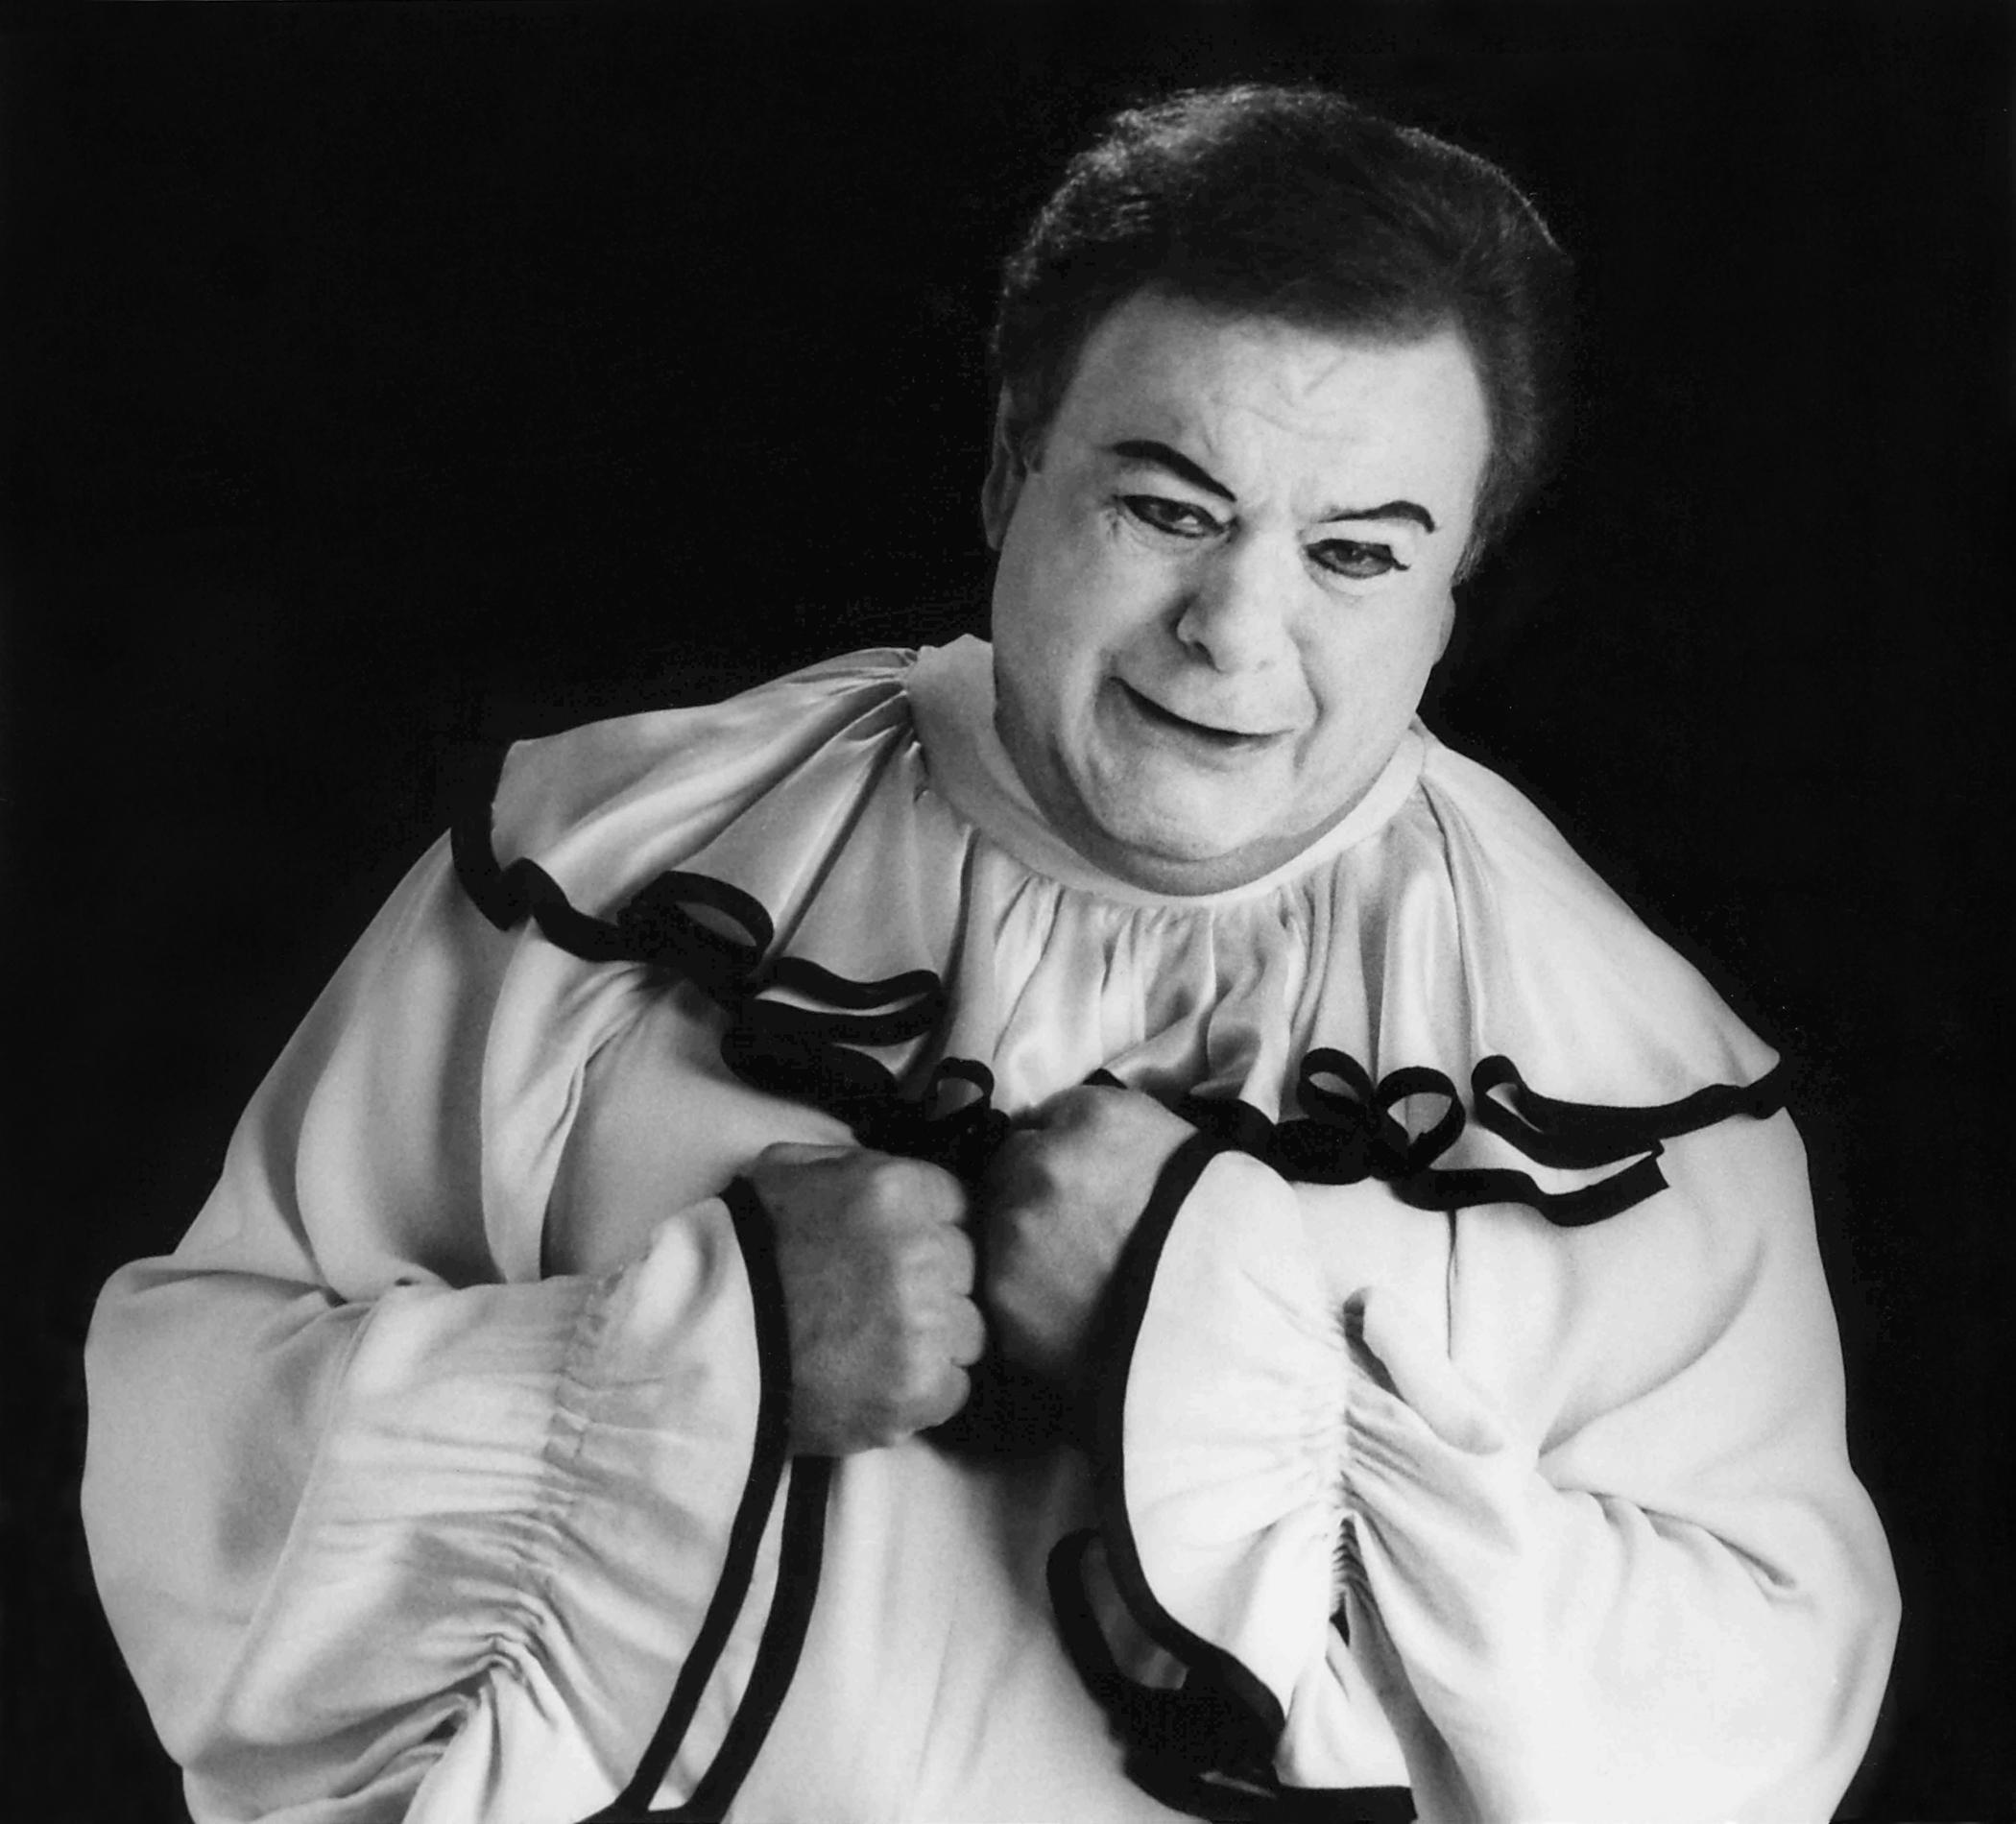 Paul Sorvino as Pagliacci